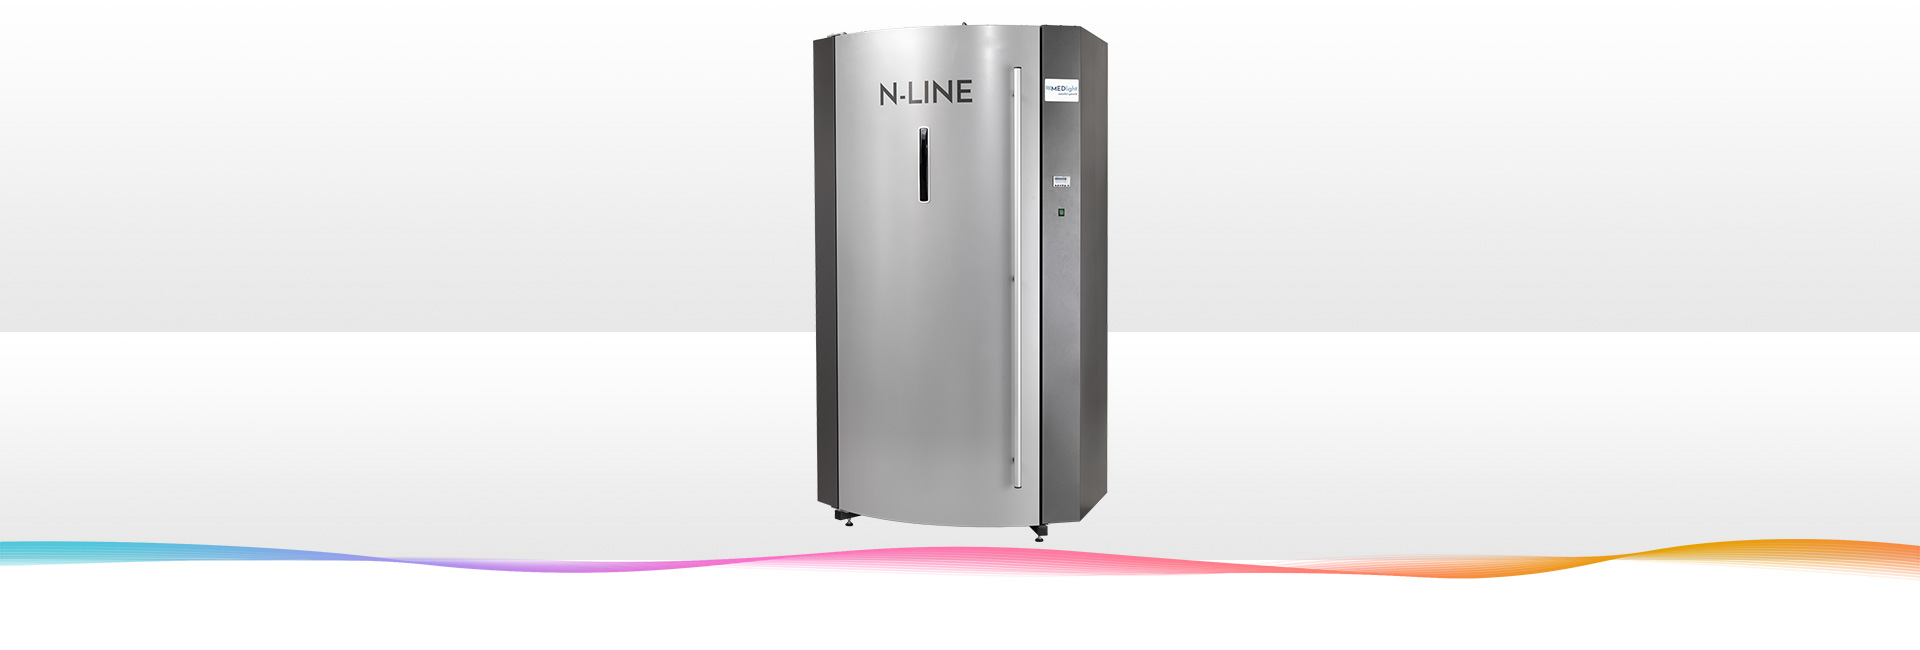 N-Line - MEDlight